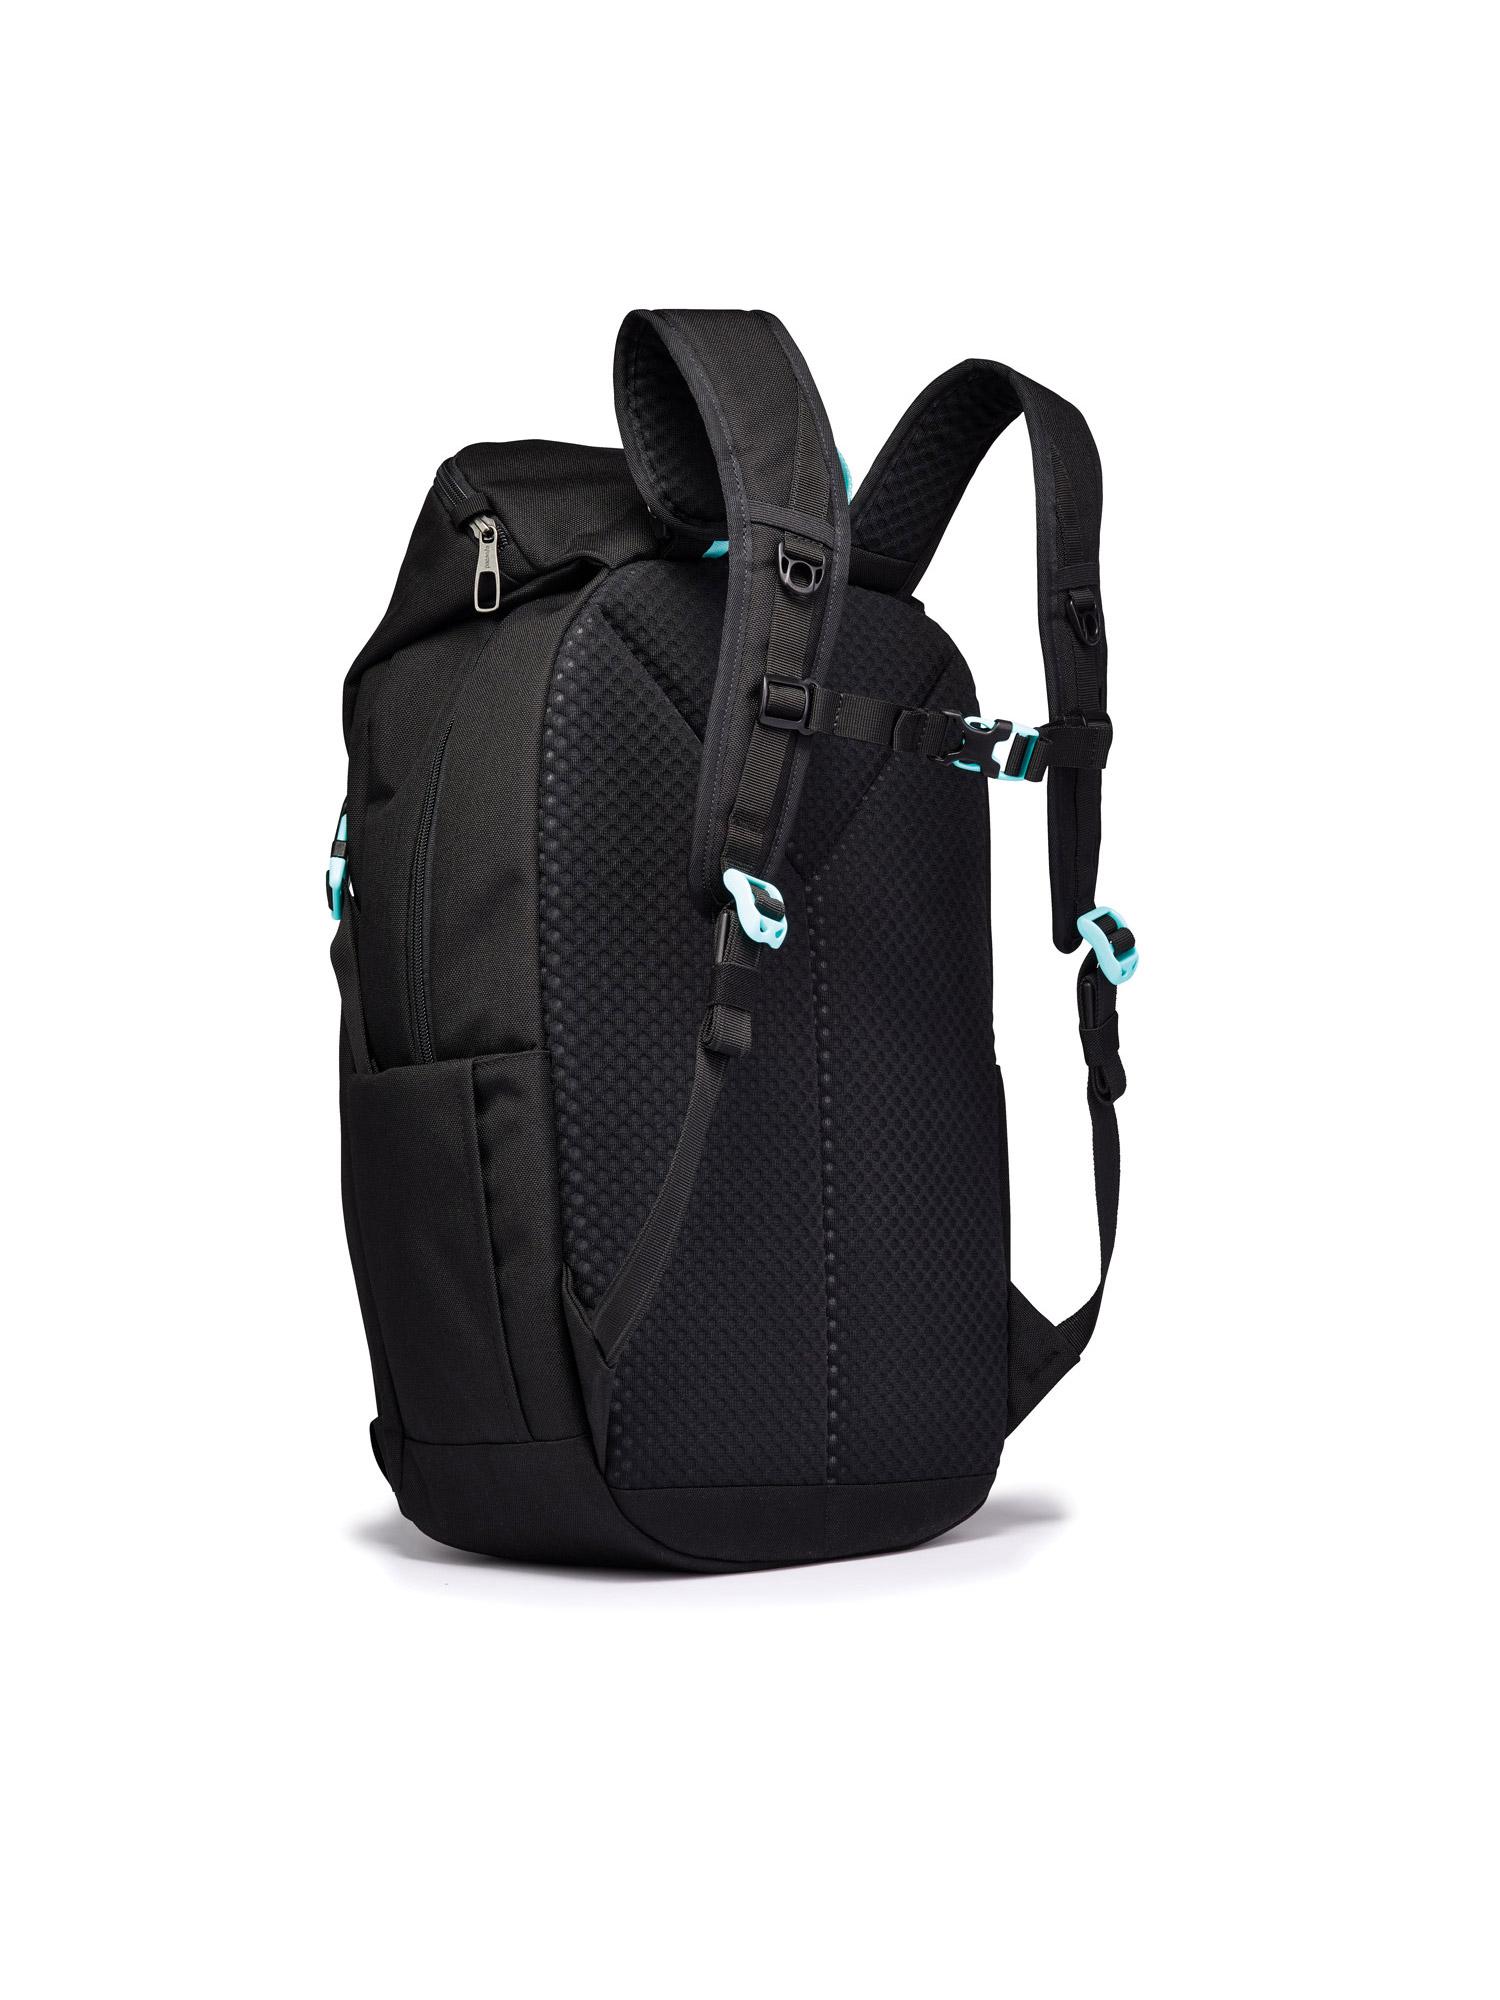 Pacsafe_DiamondSupplyCo_28L_Backpack_Alt1_Black_2.jpg